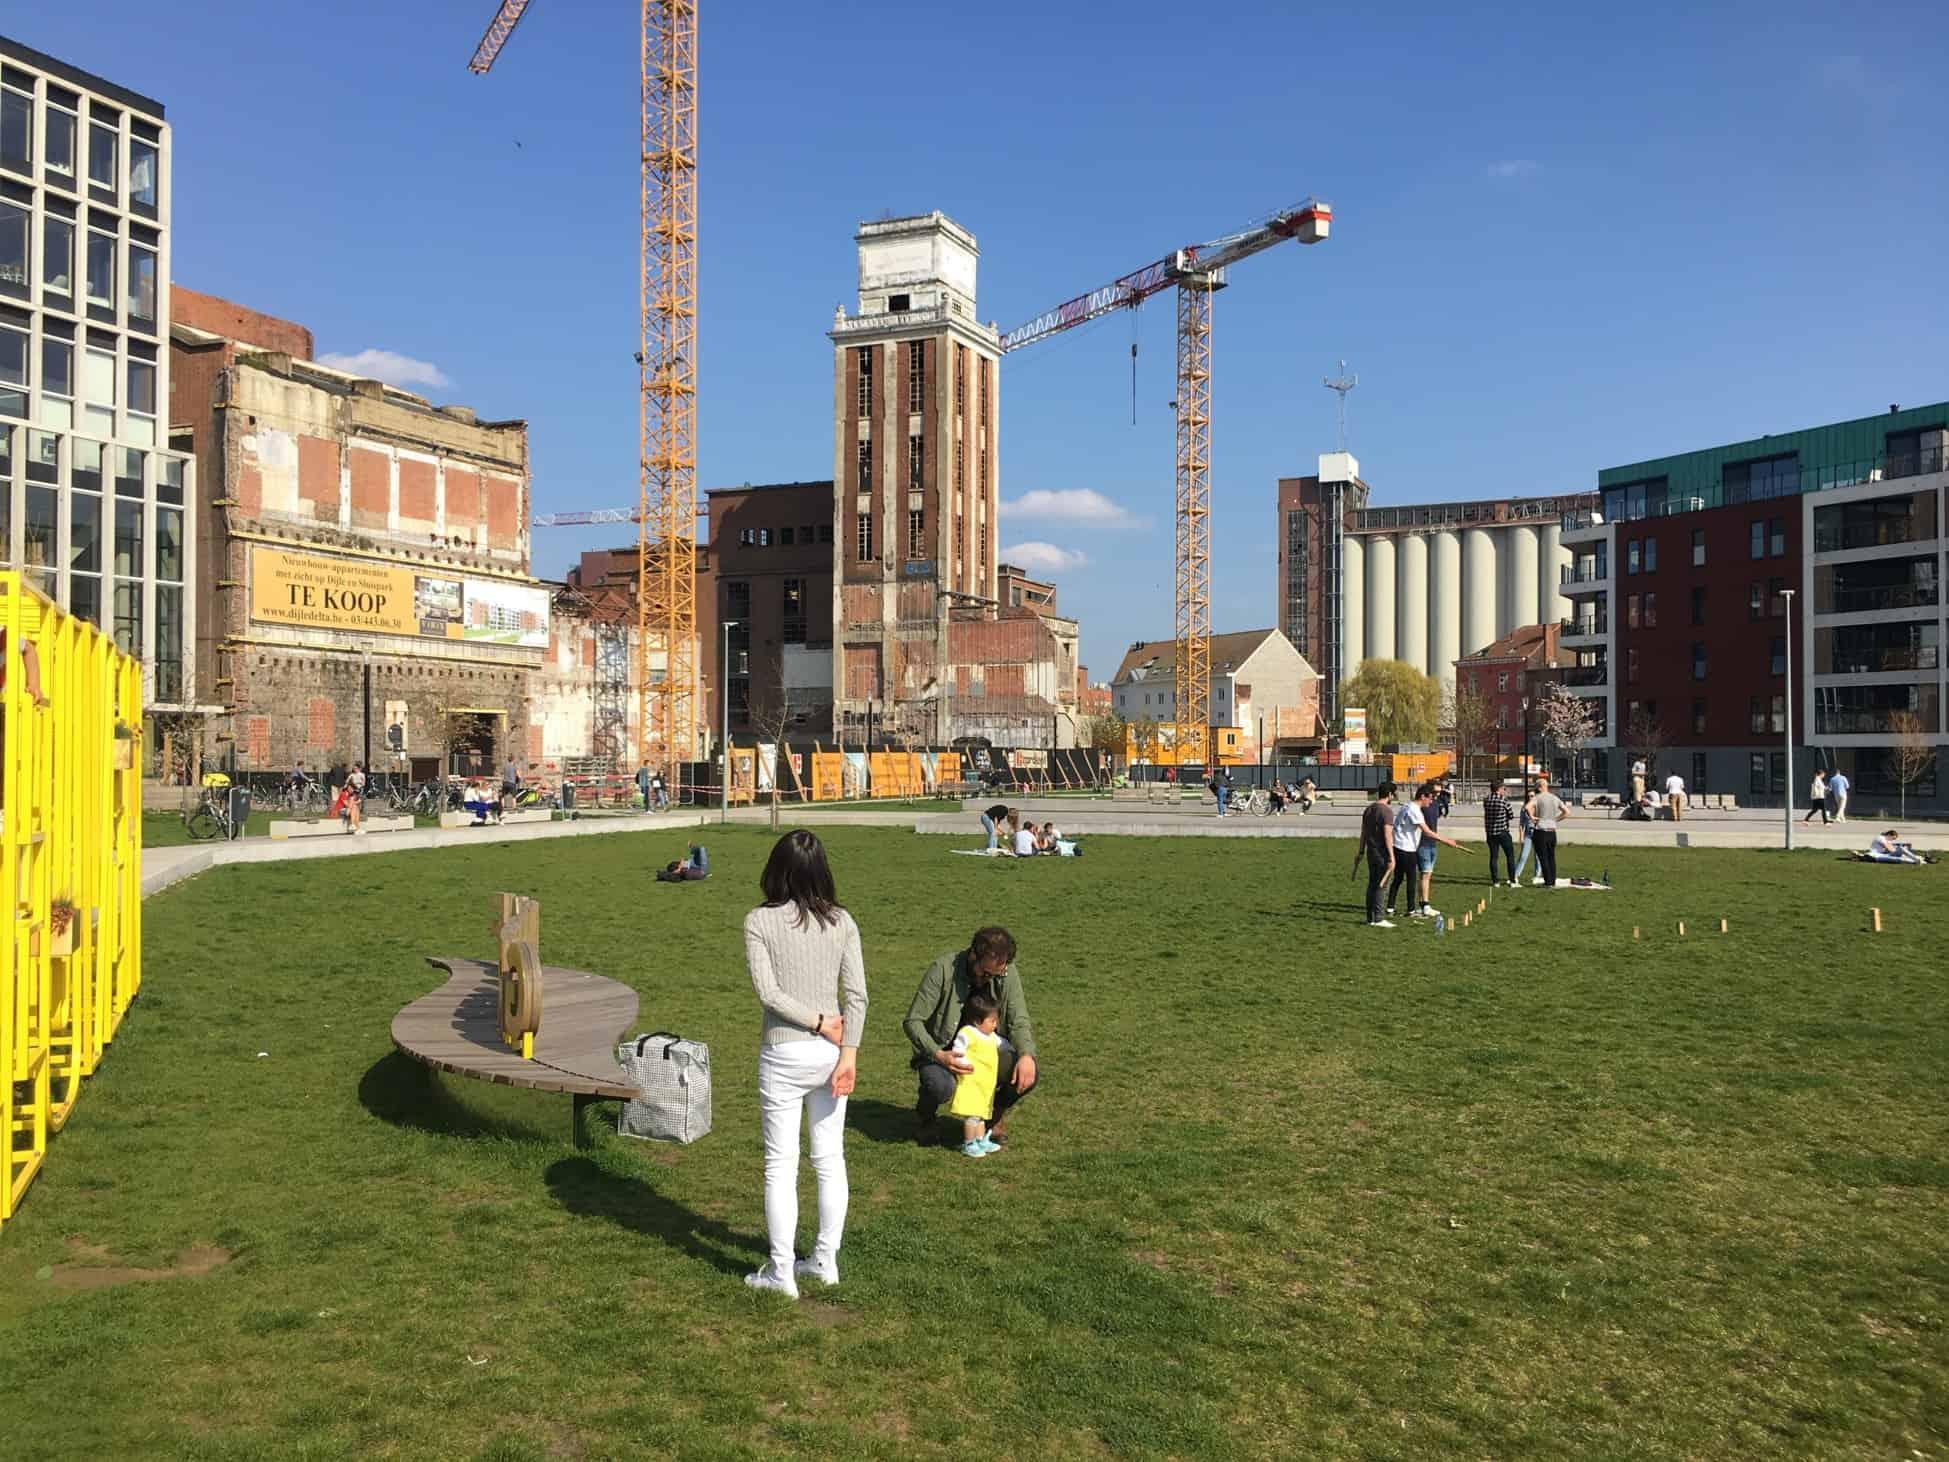 vacature openbare ruimte